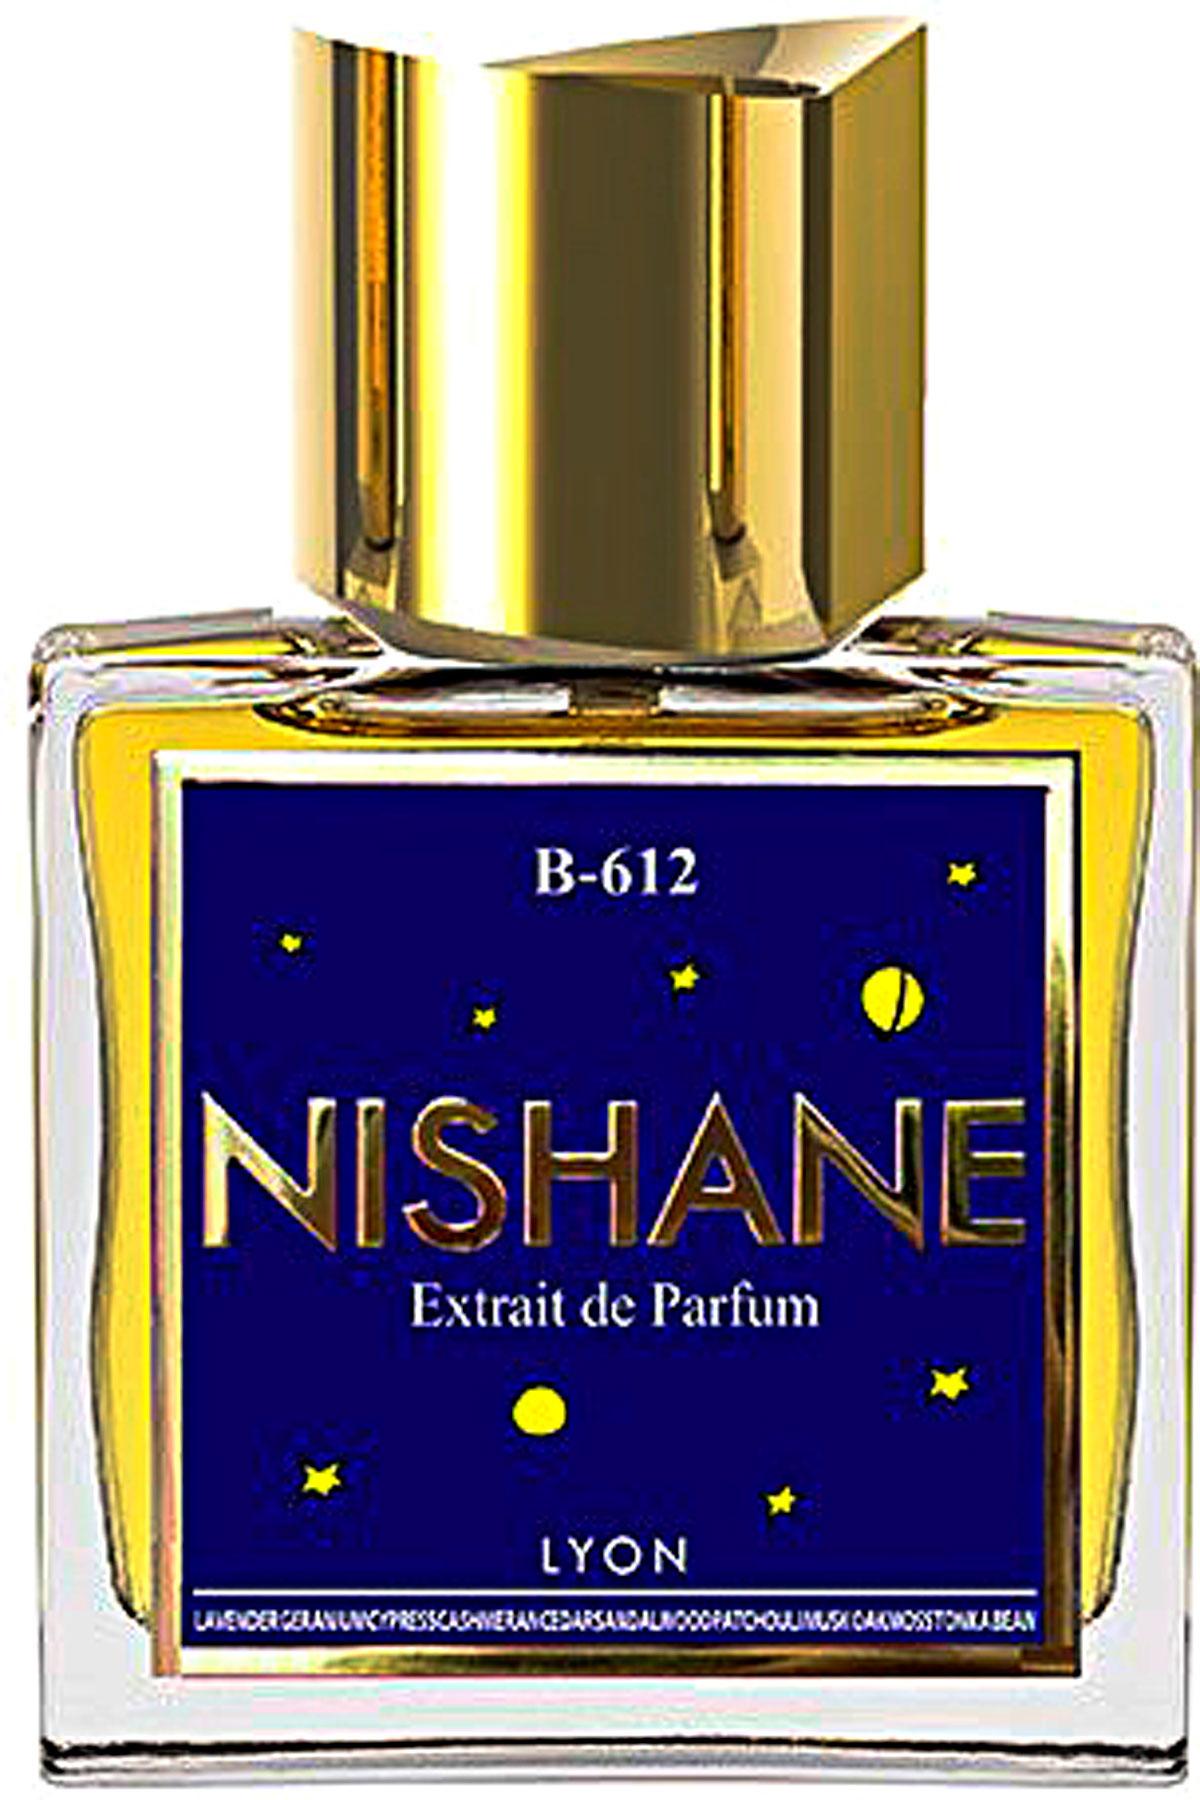 Nishane Fragrances for Women, B-612 - Extrait De Parfum - 50 Ml, 2019, 50 ml